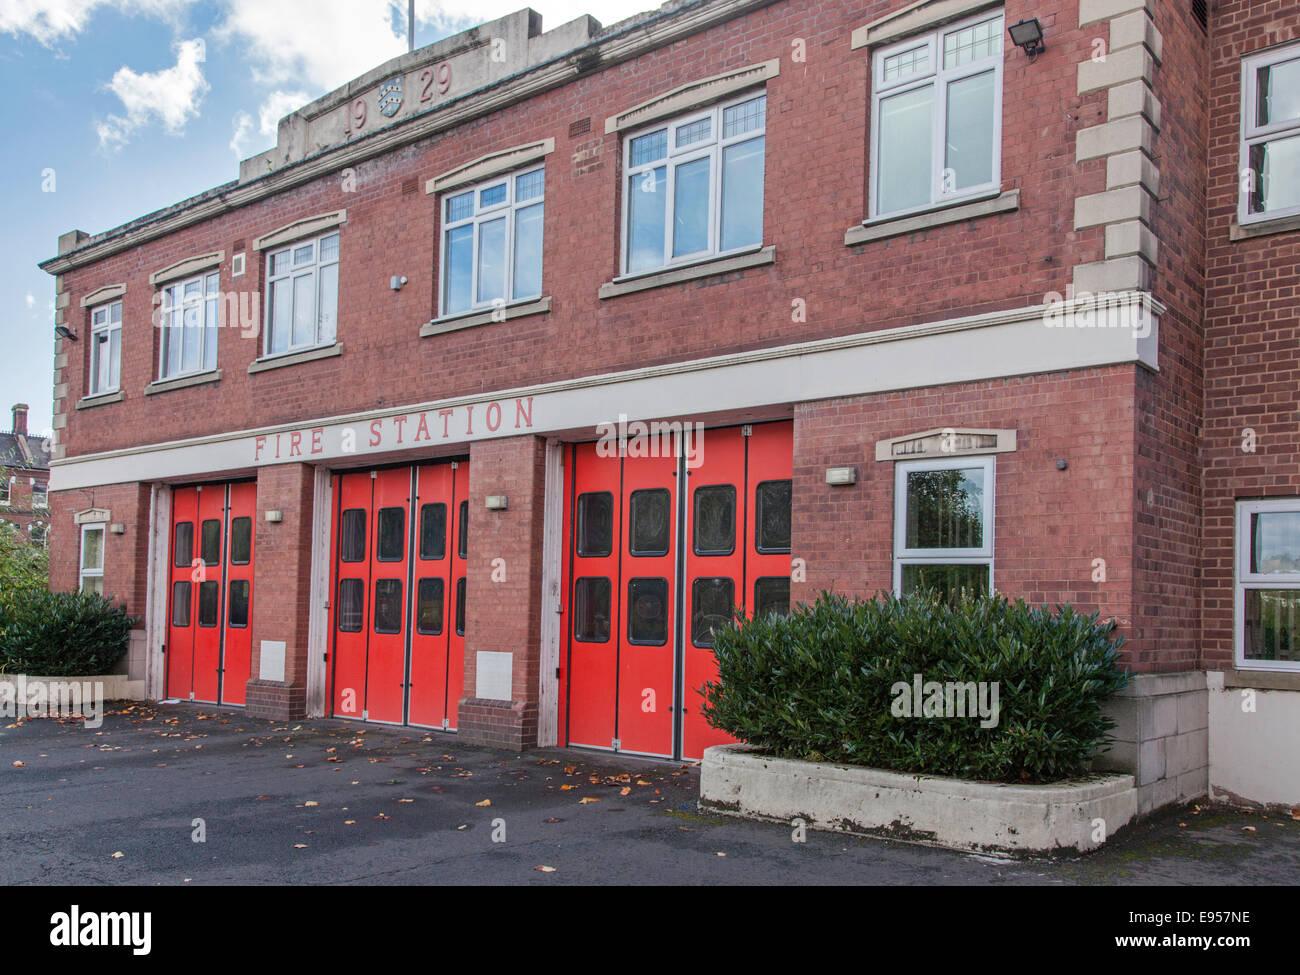 Kidderminster Fire Station, Castle Road, Worcestershire, England, UK - Stock Image